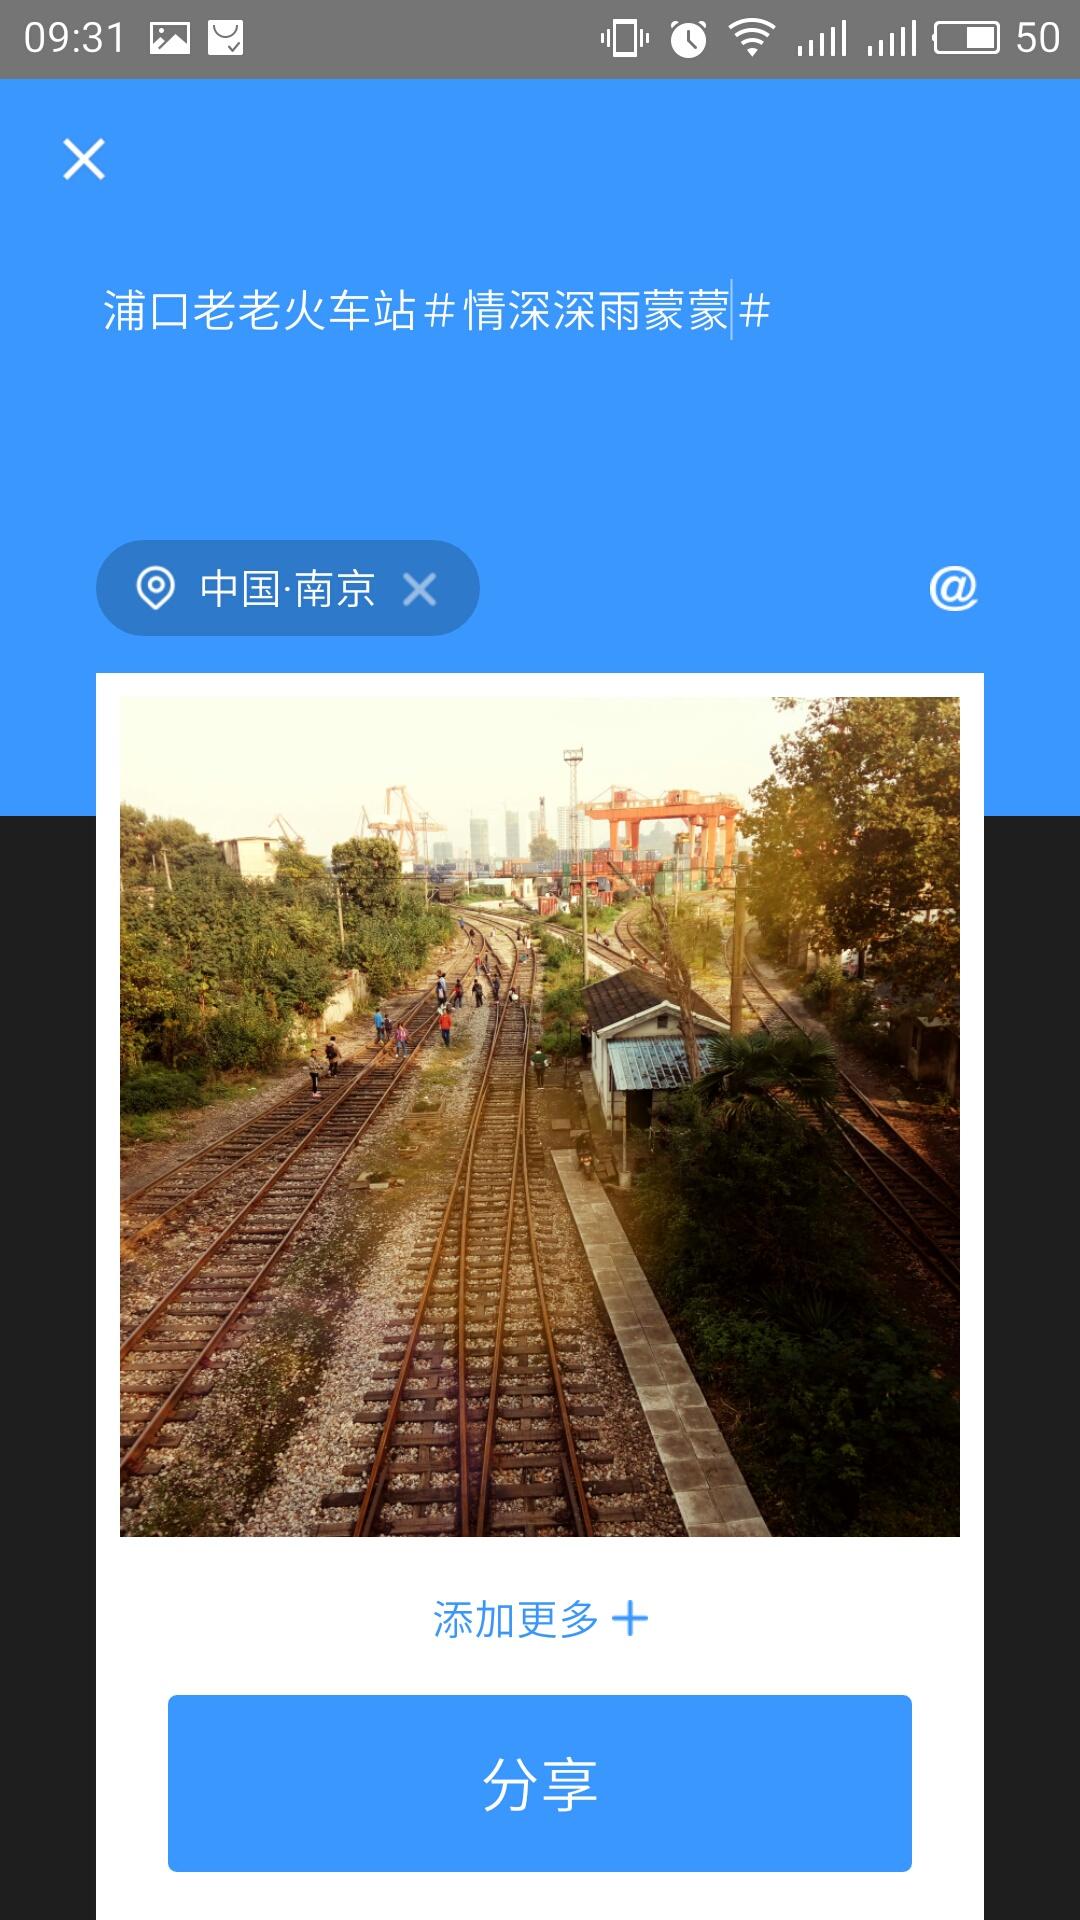 相机360(Camera360)